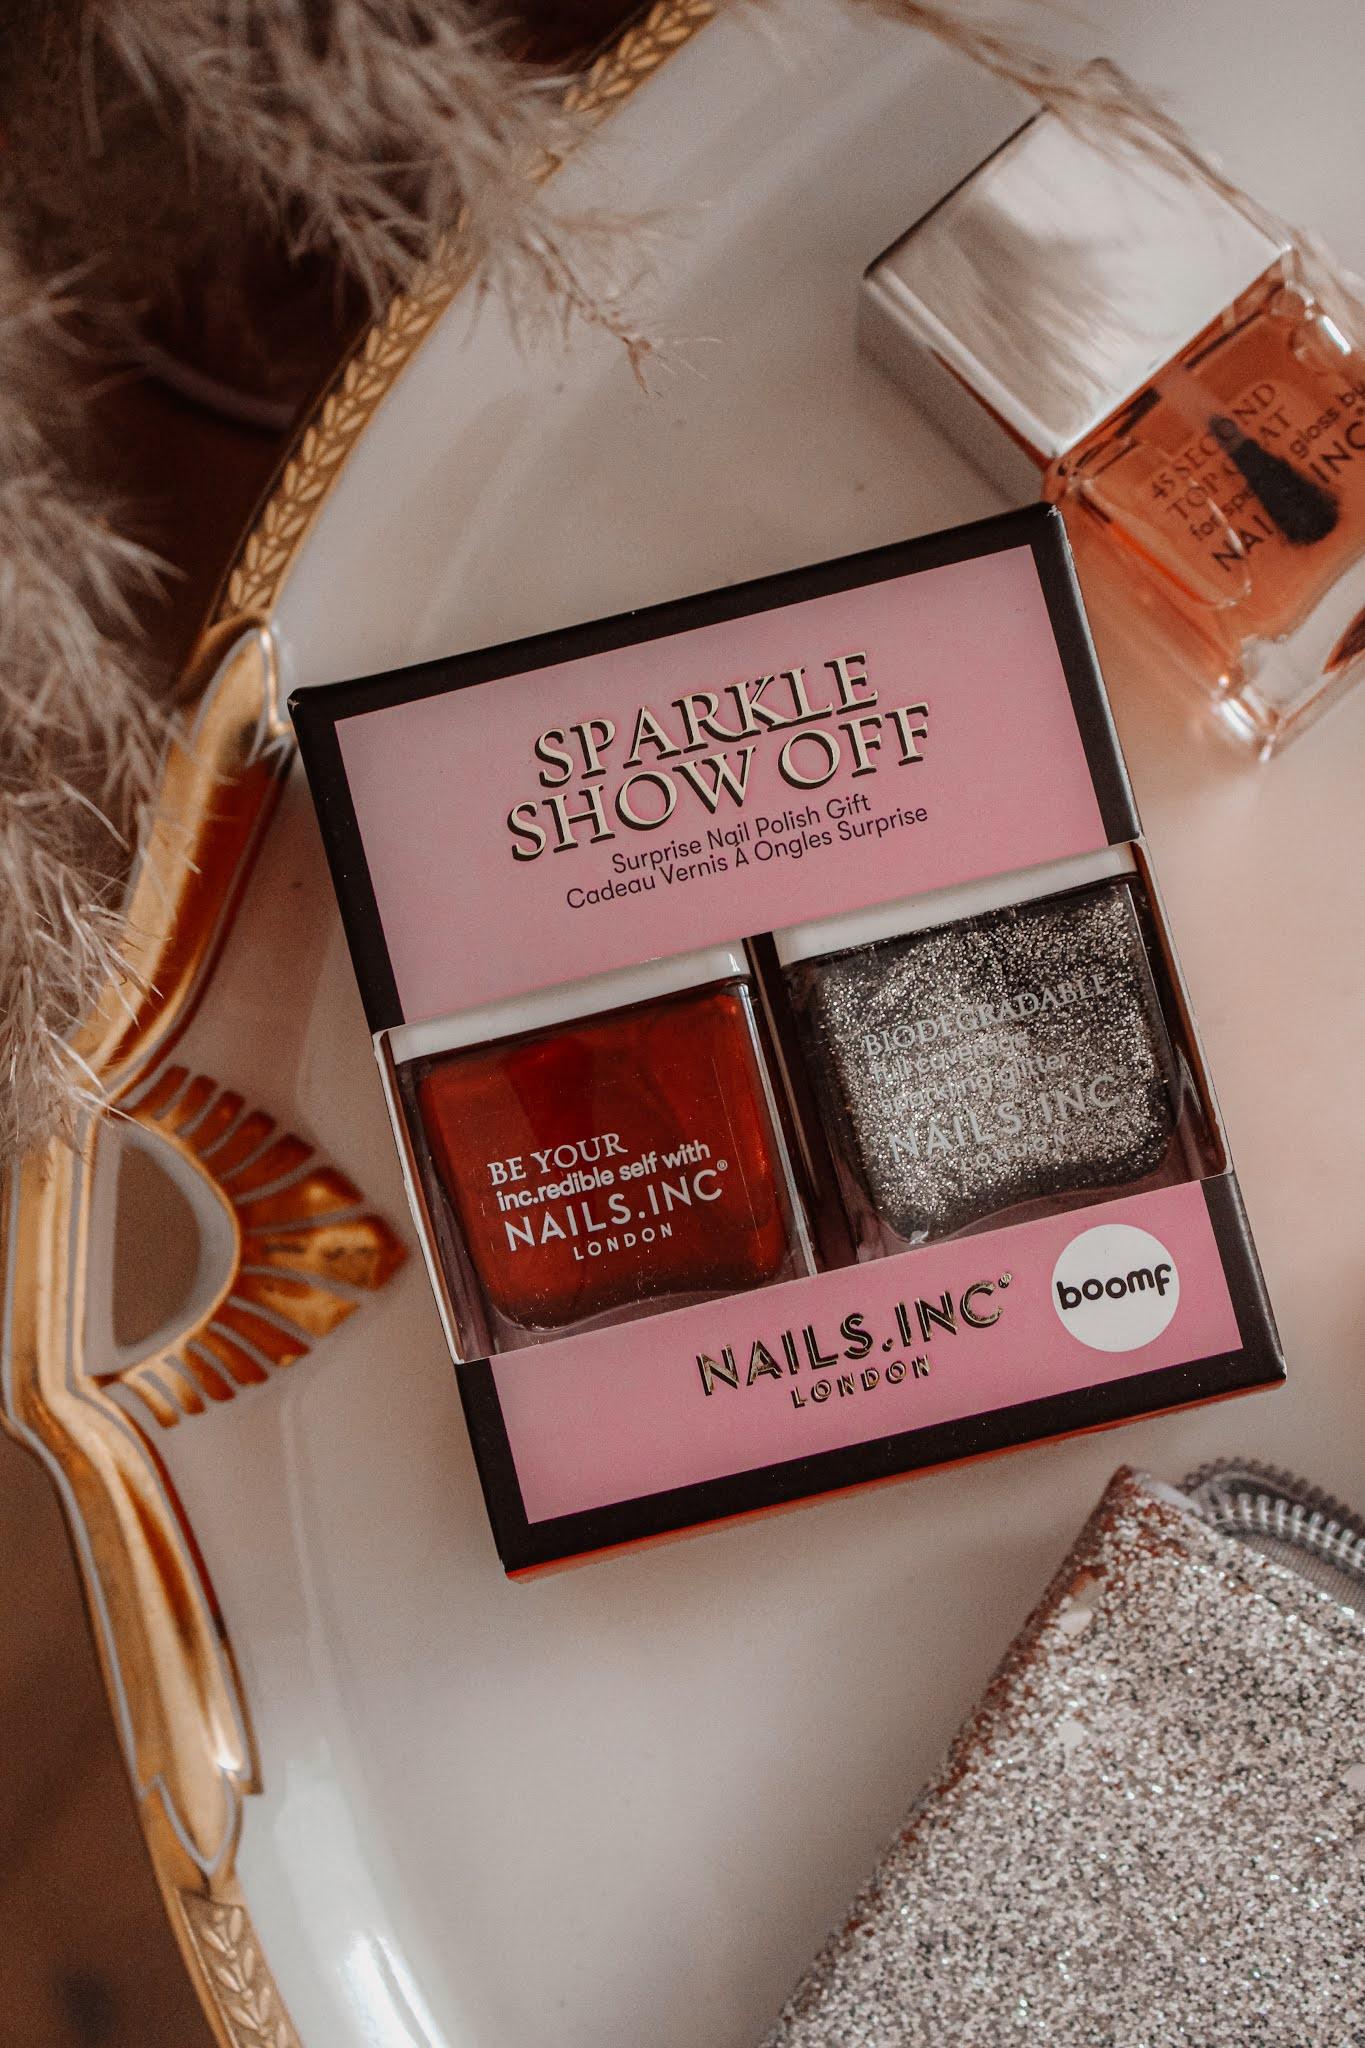 Nails Inc Sparkle Show Off Gift Set